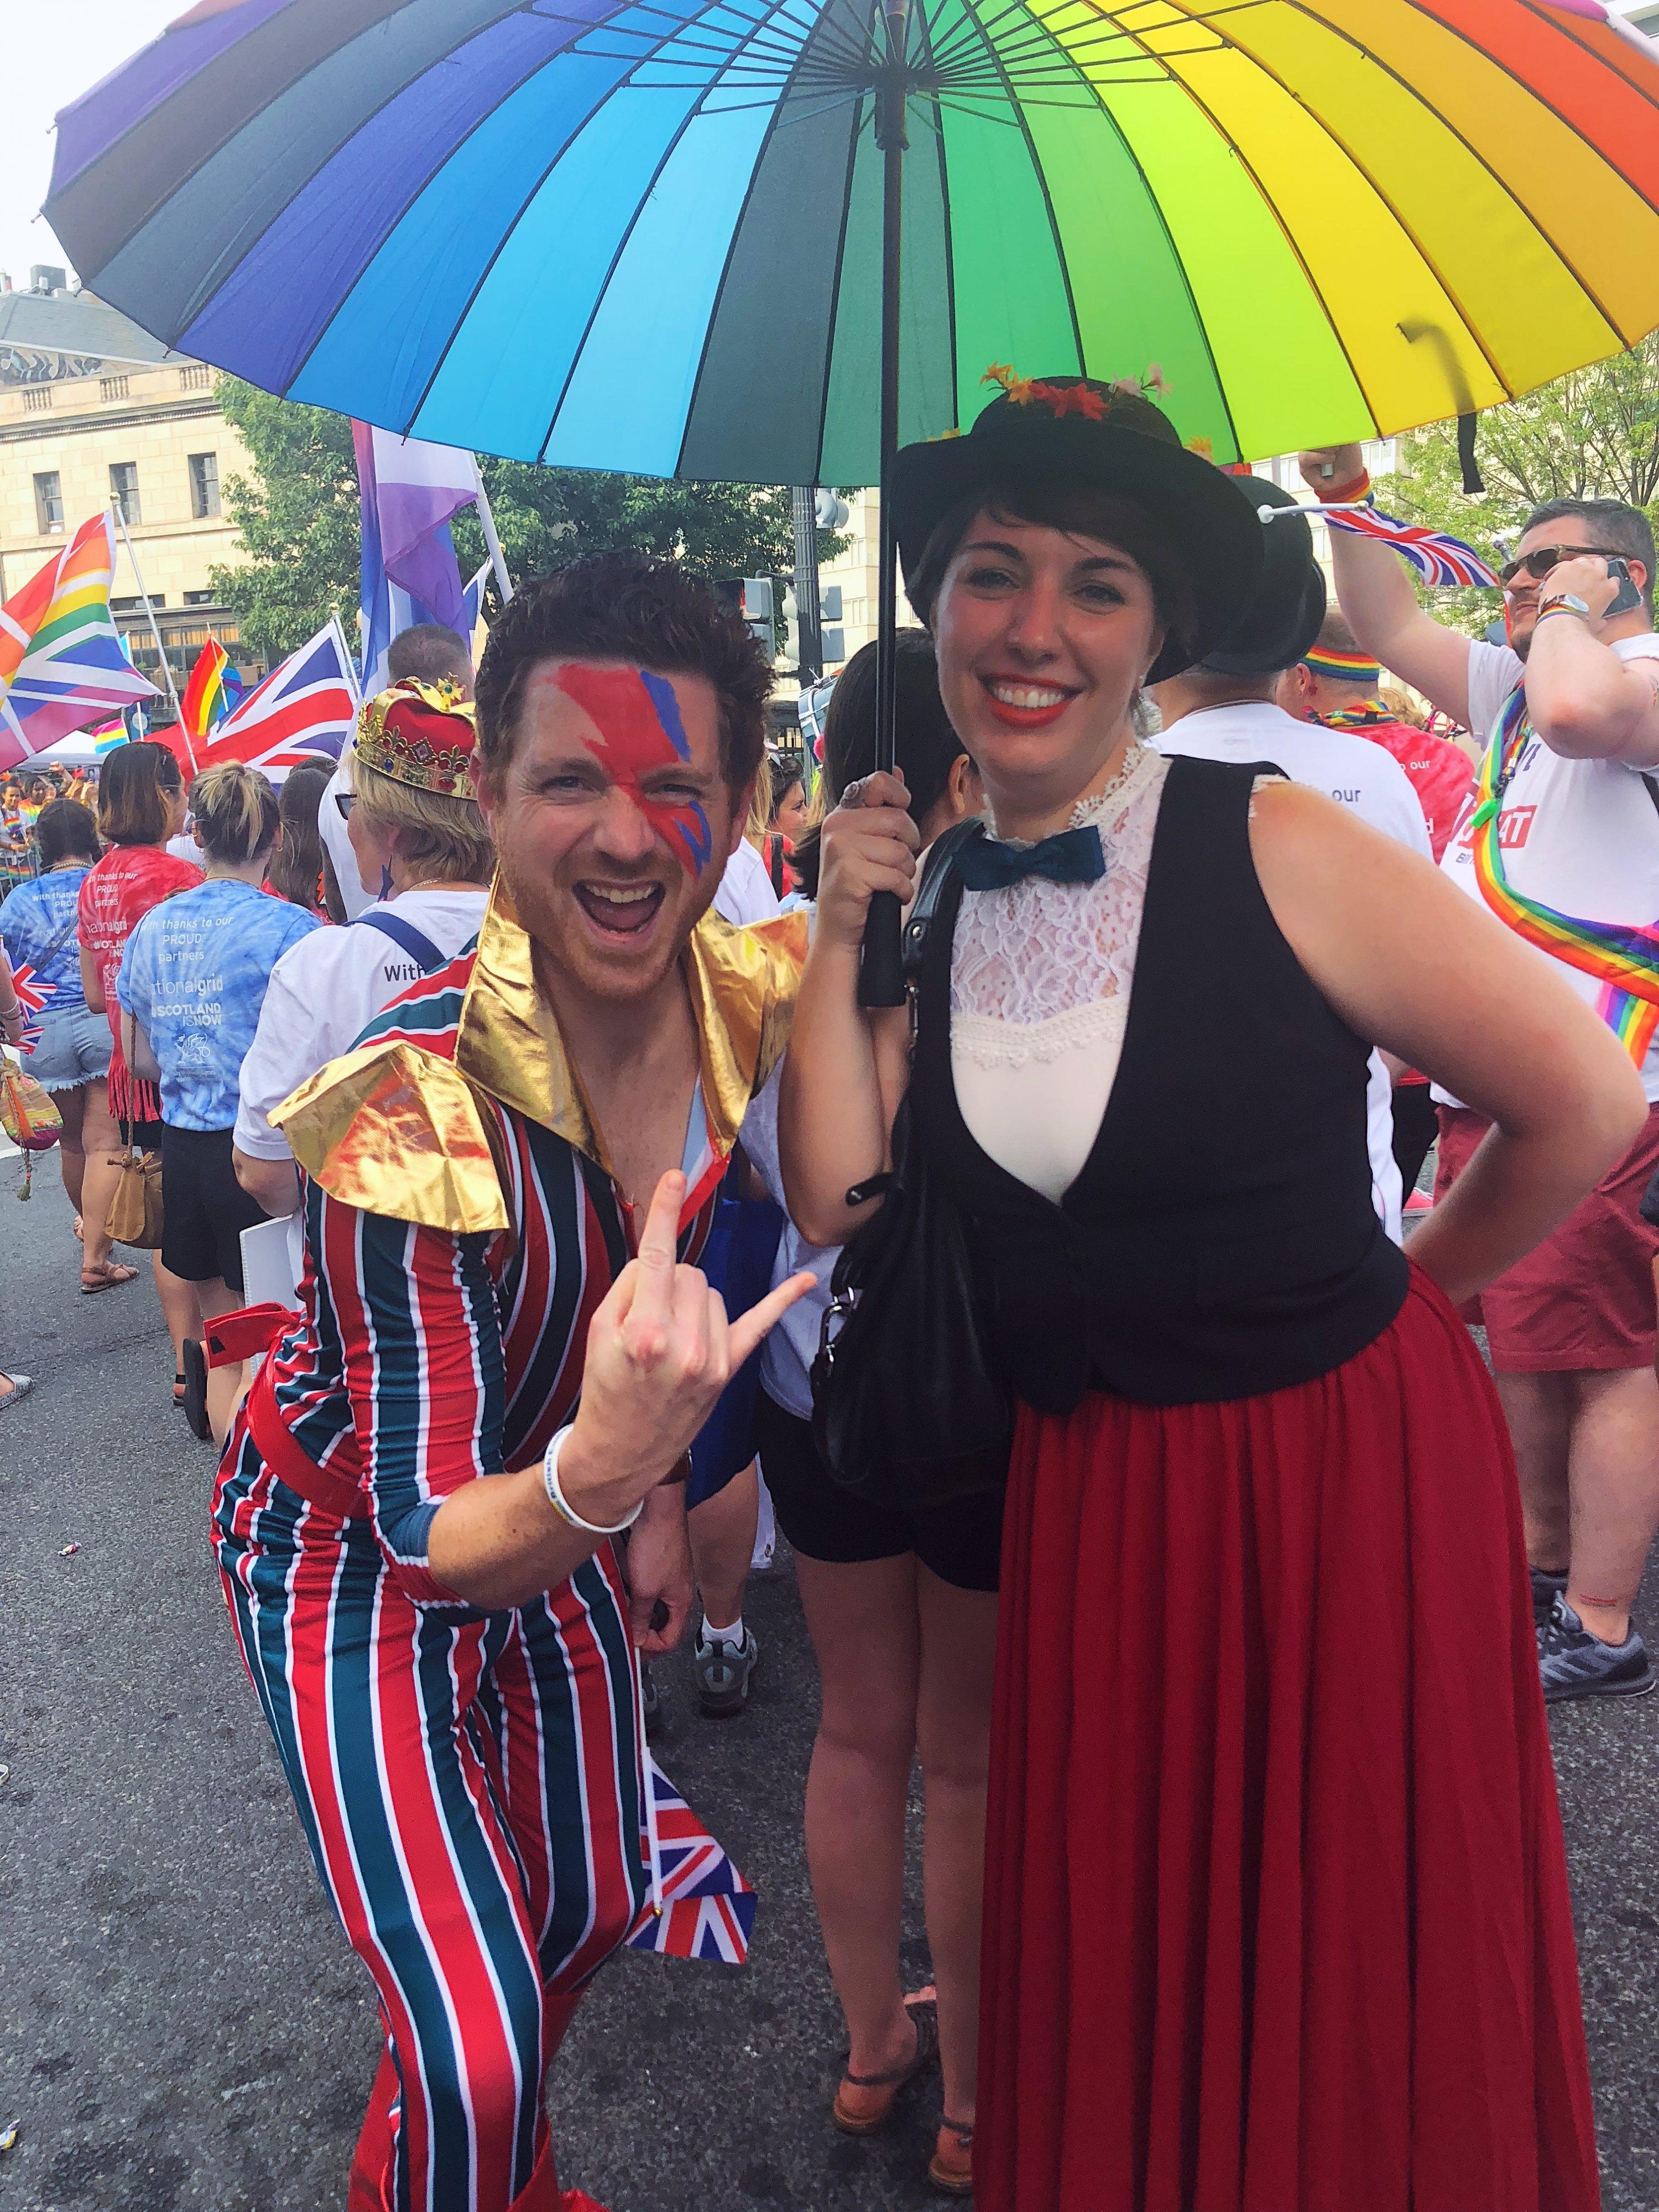 David Bowie and Mary Poppins underneath a rainbow umbrella. Photograph by Daniella Byck.